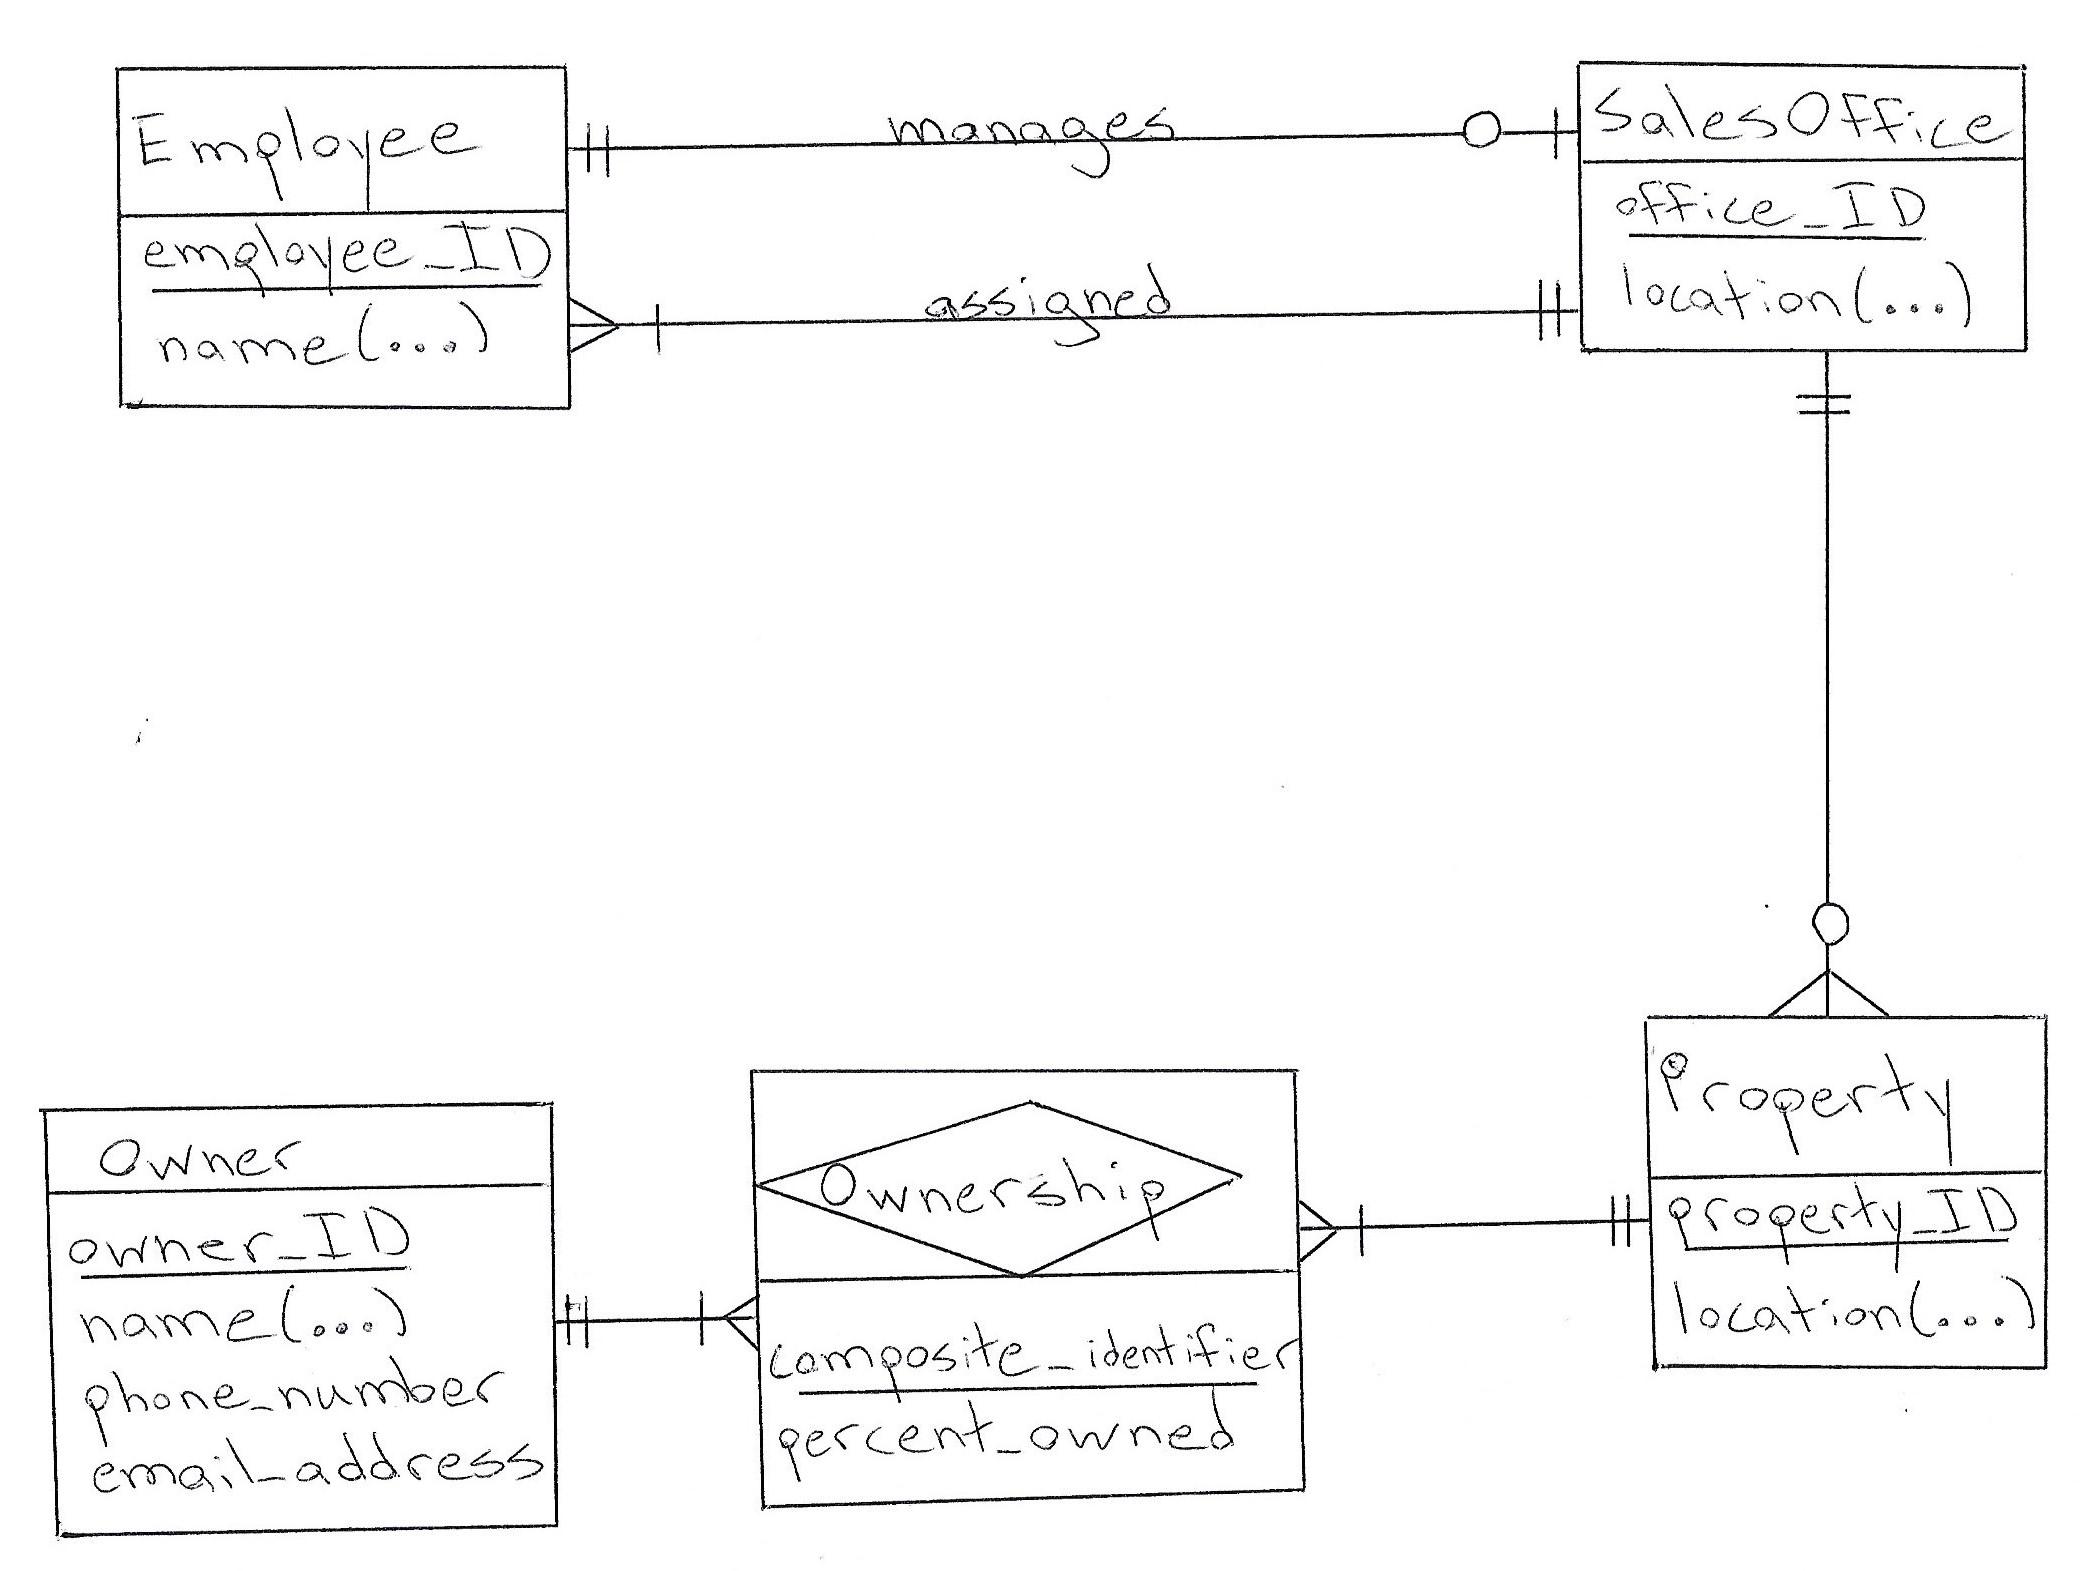 Database Design: How To Design A Database